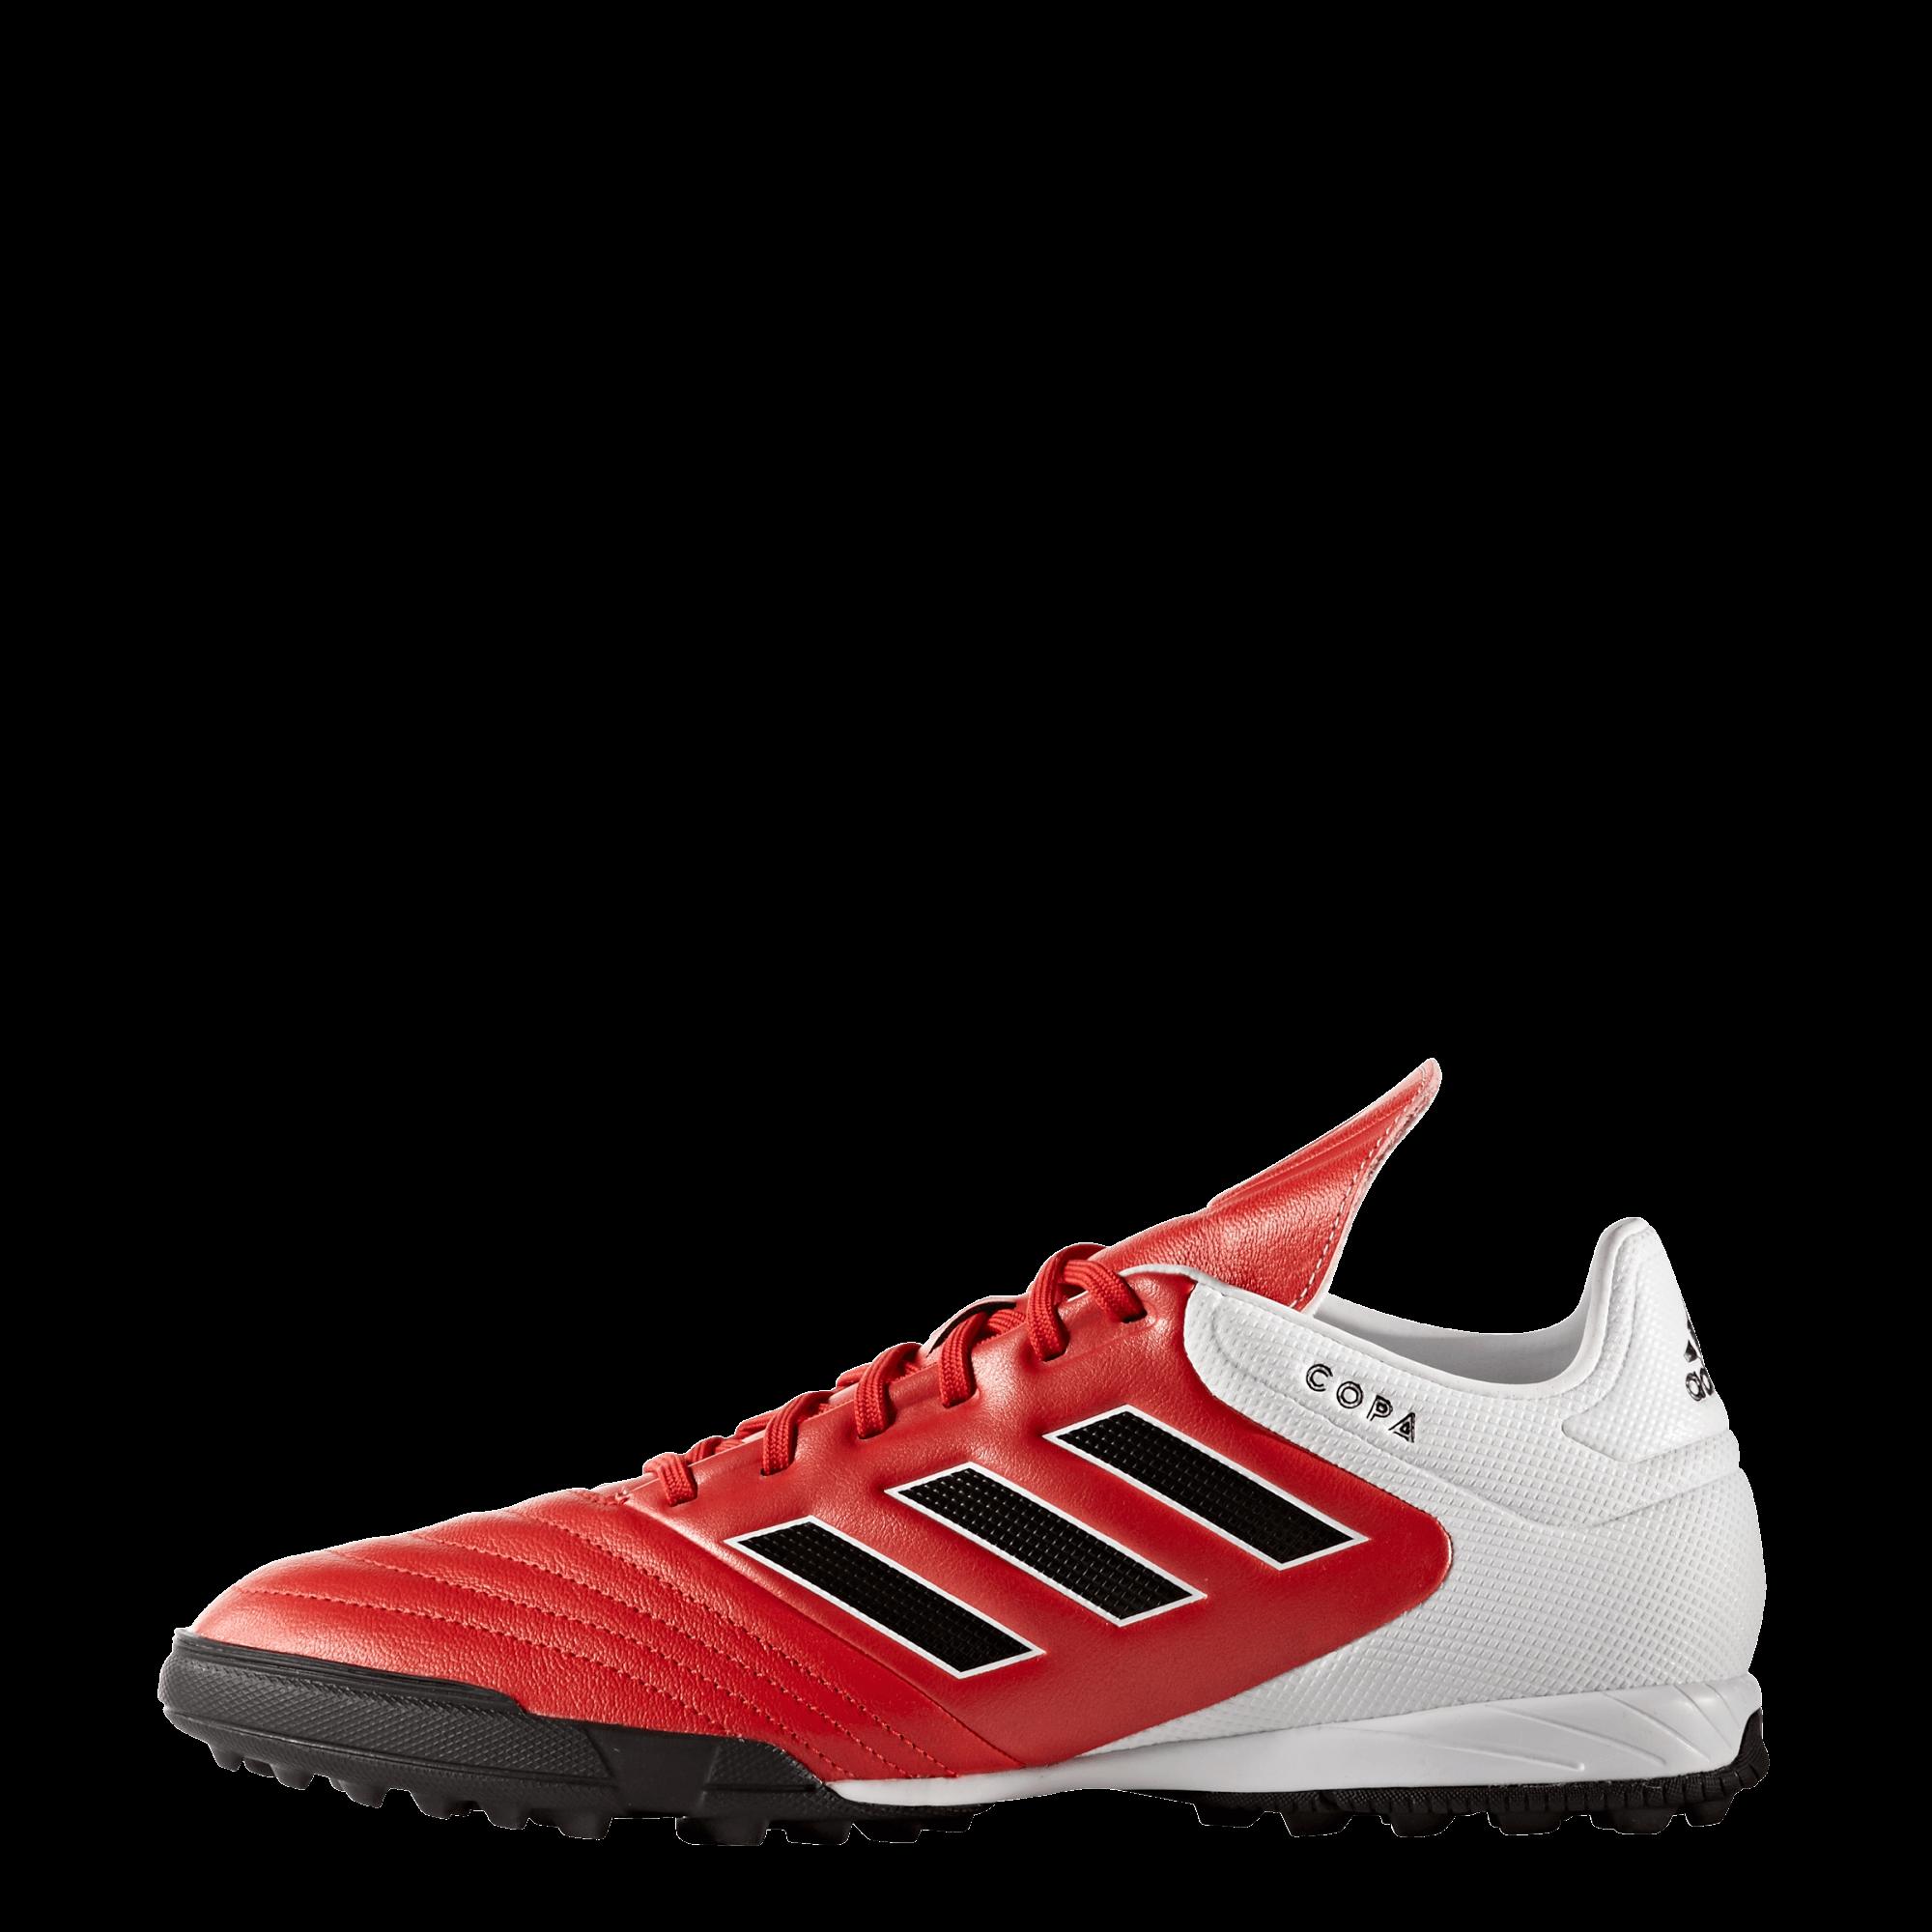 big sale 35775 60abc adidas Copa 17.3 TF Red